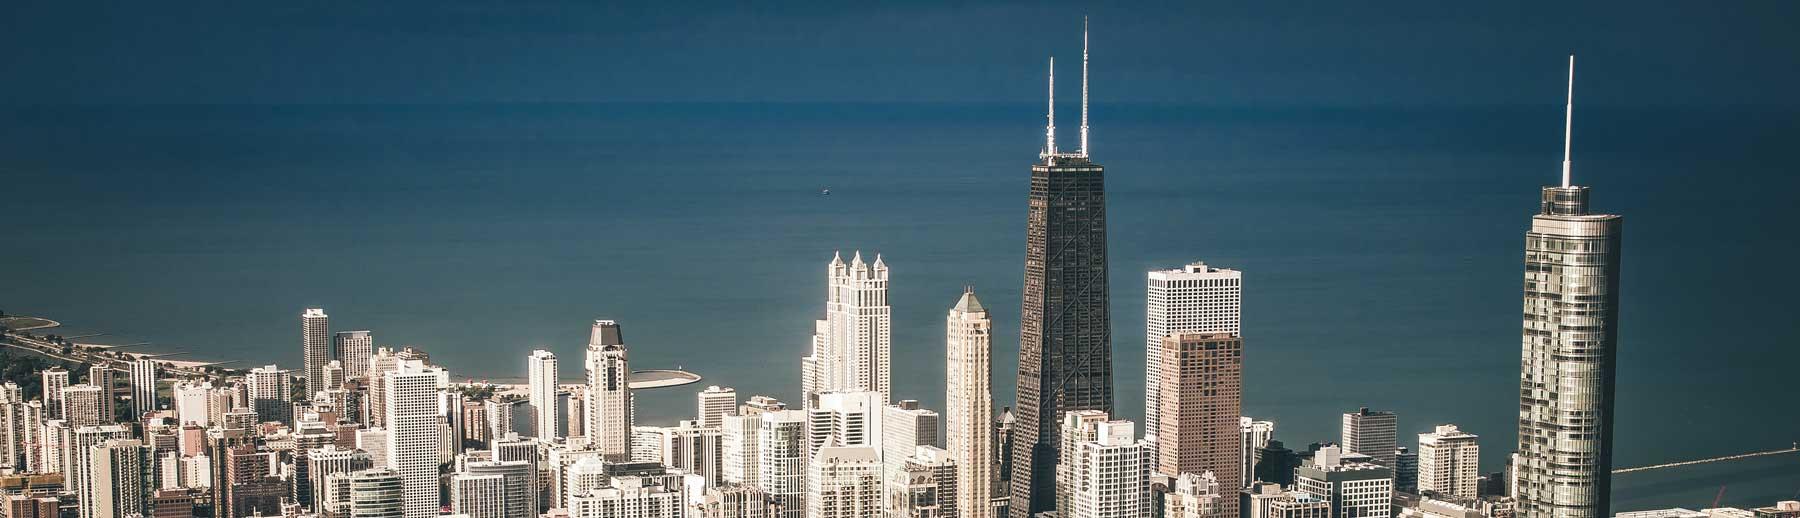 Global Industry Skyline